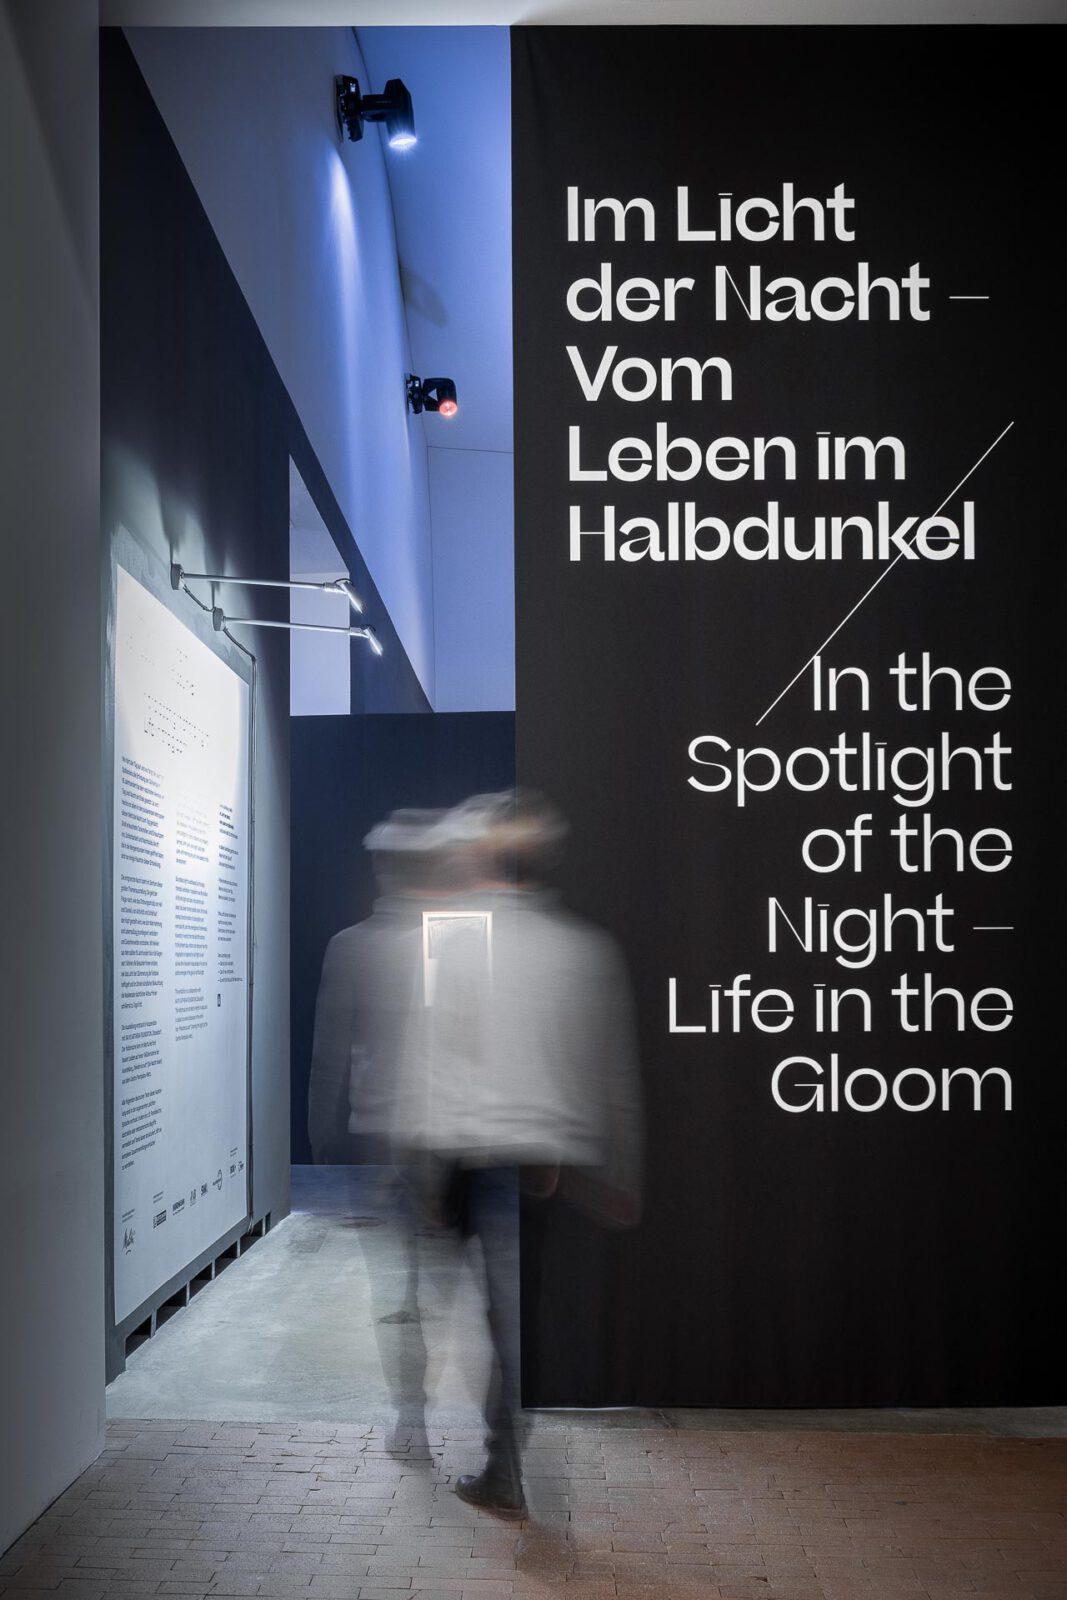 1_L_BOK_Nacht_Marta_12-12-2019_TE_4097